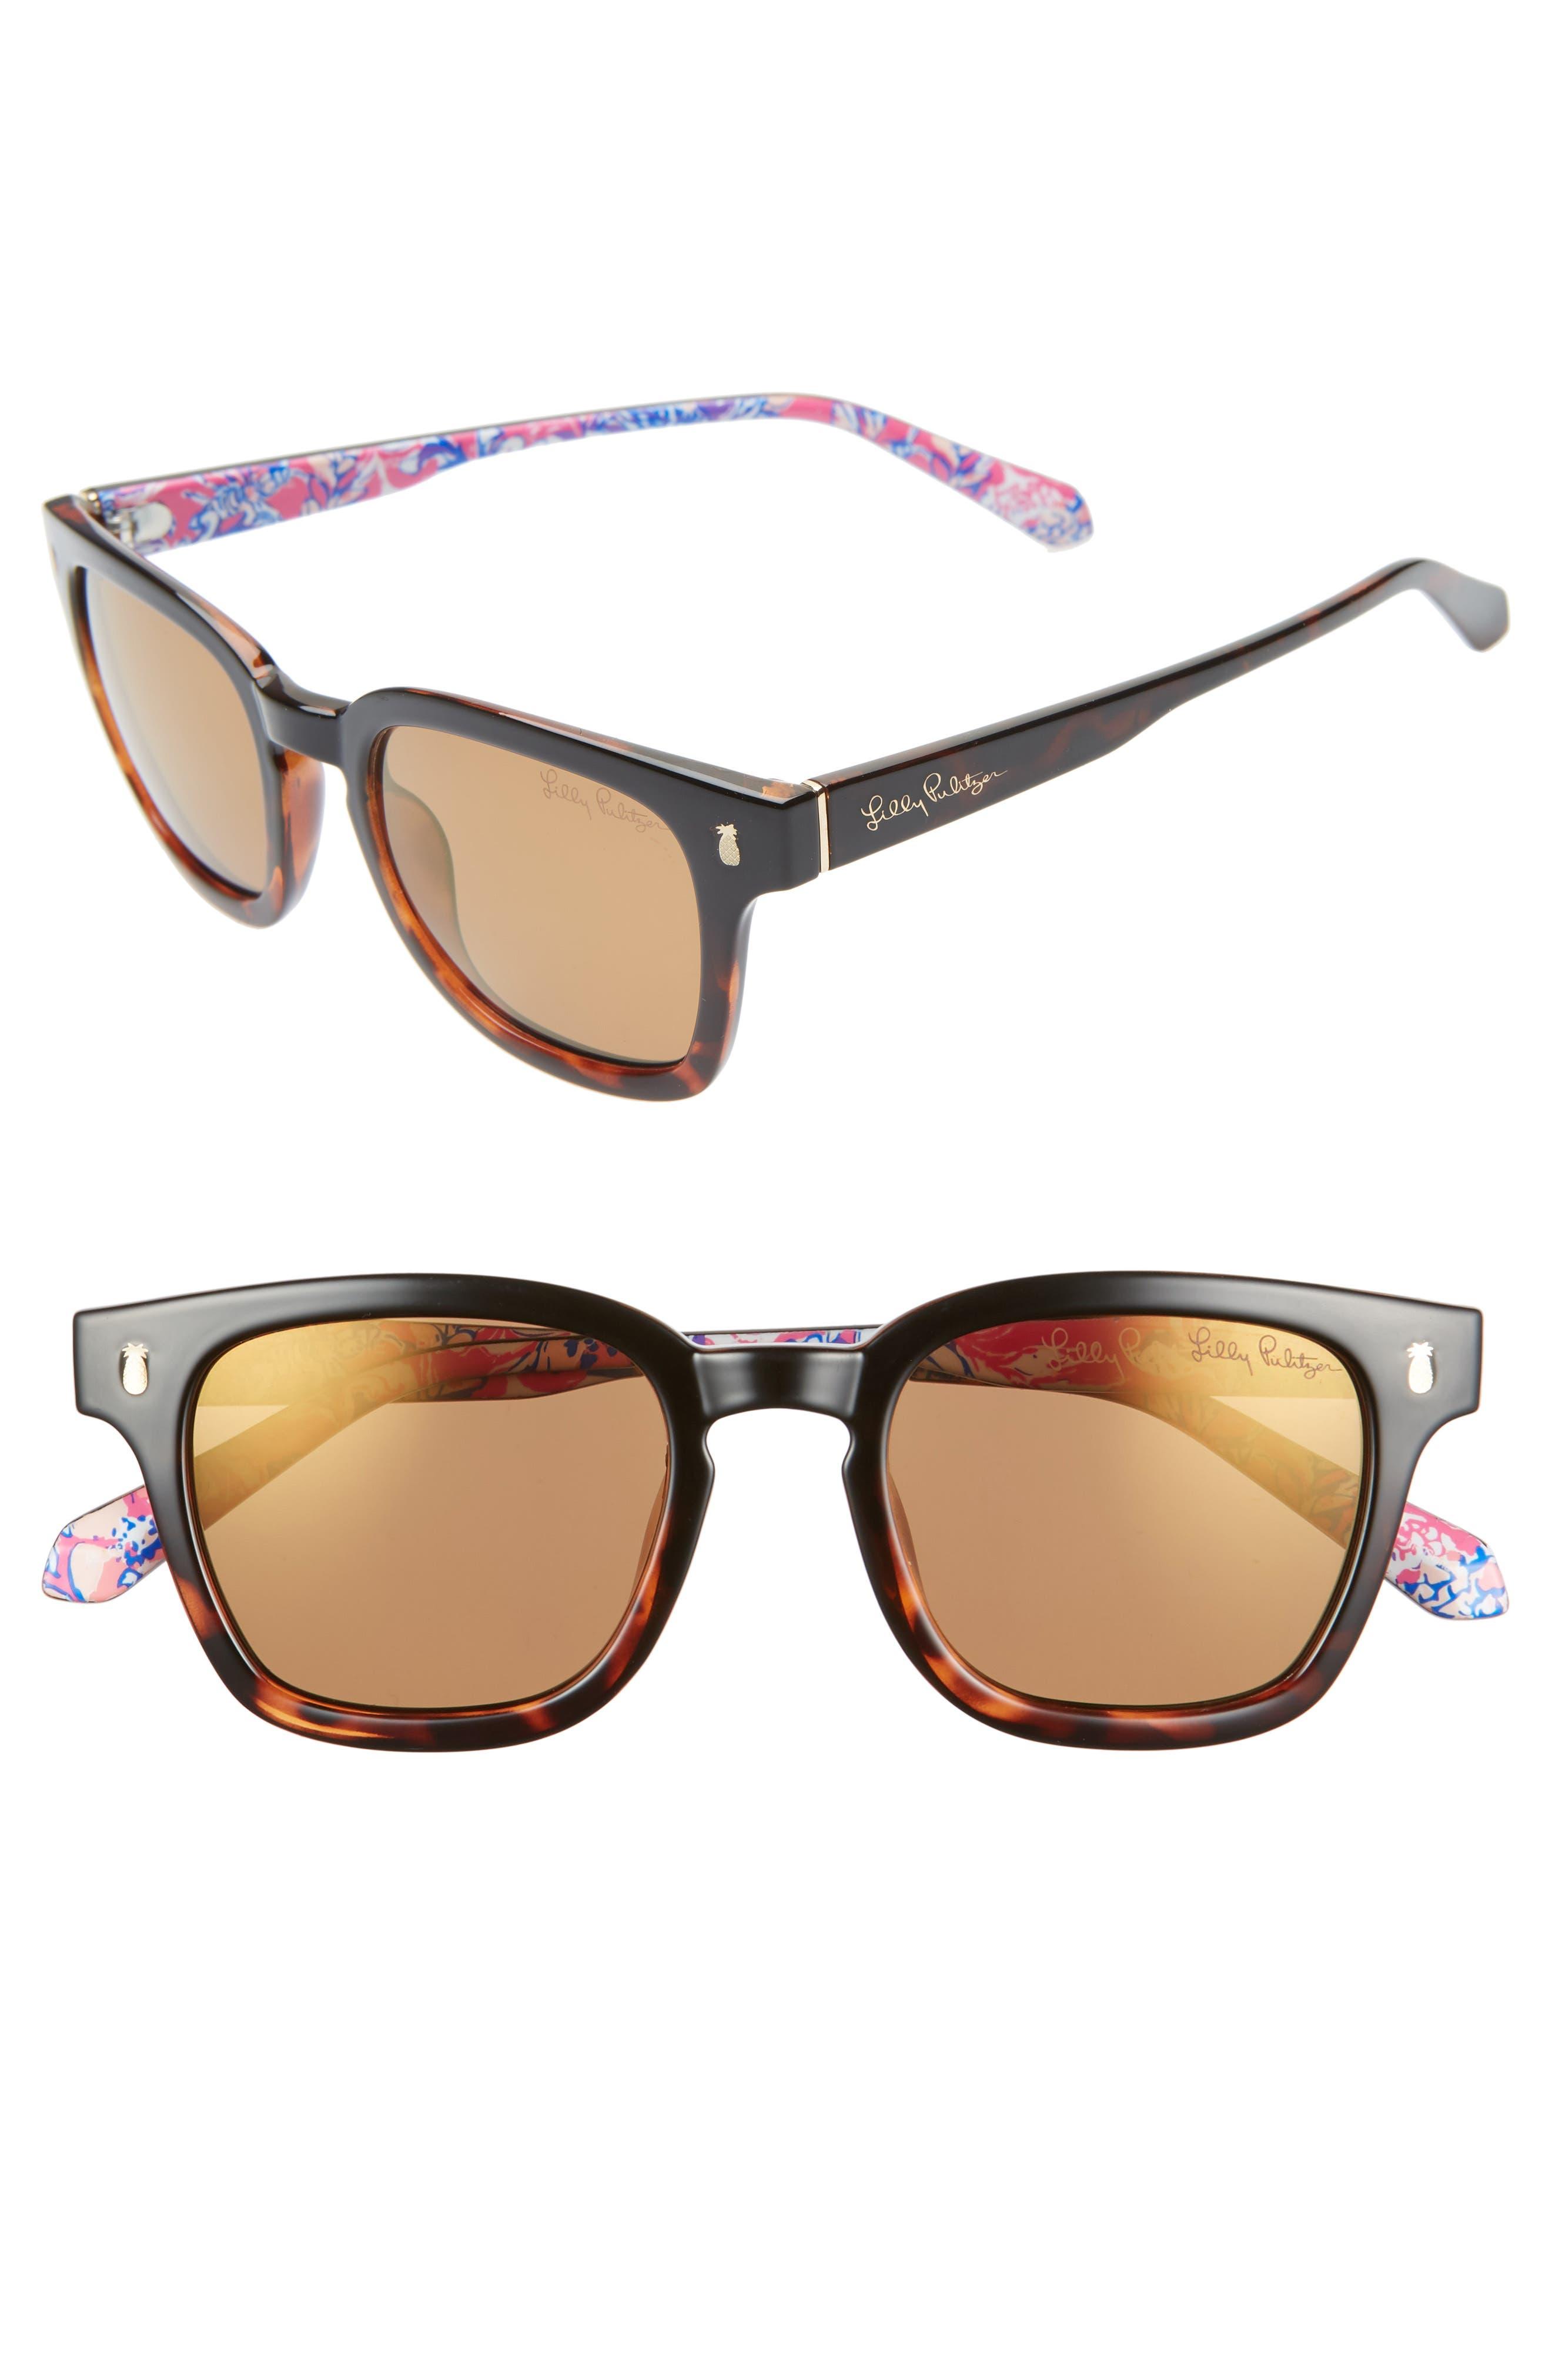 Lilly Pulitzer Josie 4m Rectangular Sunglasses - Black To Tortoise/ Gold Flash